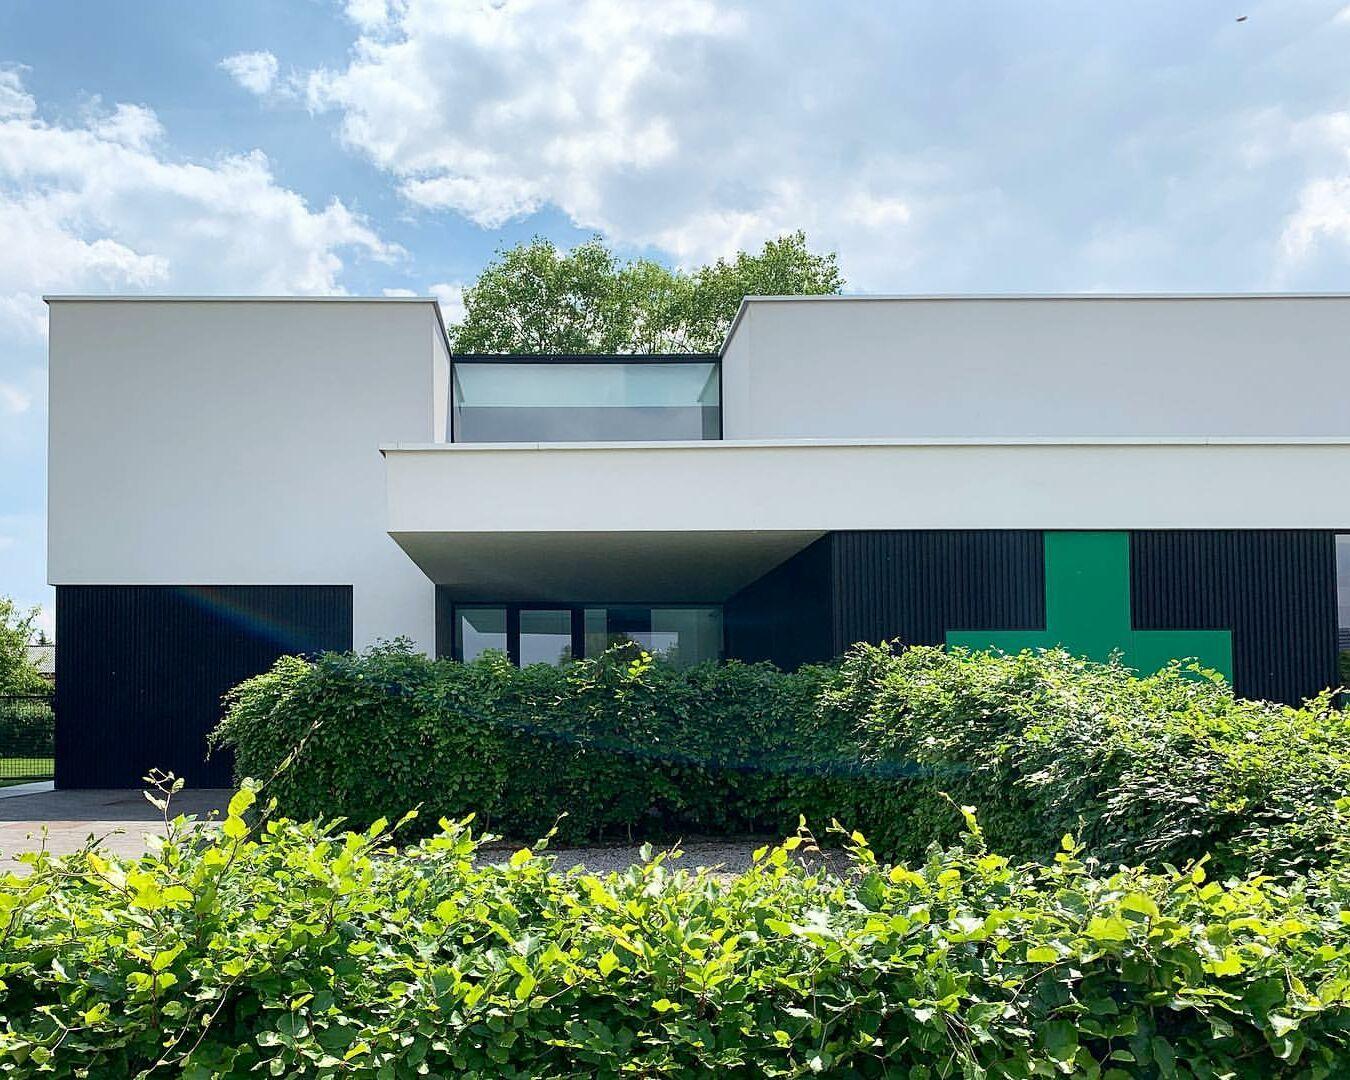 60182703 1915451451893885 7130413498435897859 n uai | Baeyens & Beck architecten Gent | architect nieuwbouw renovatie interieur | high end | architectenbureau